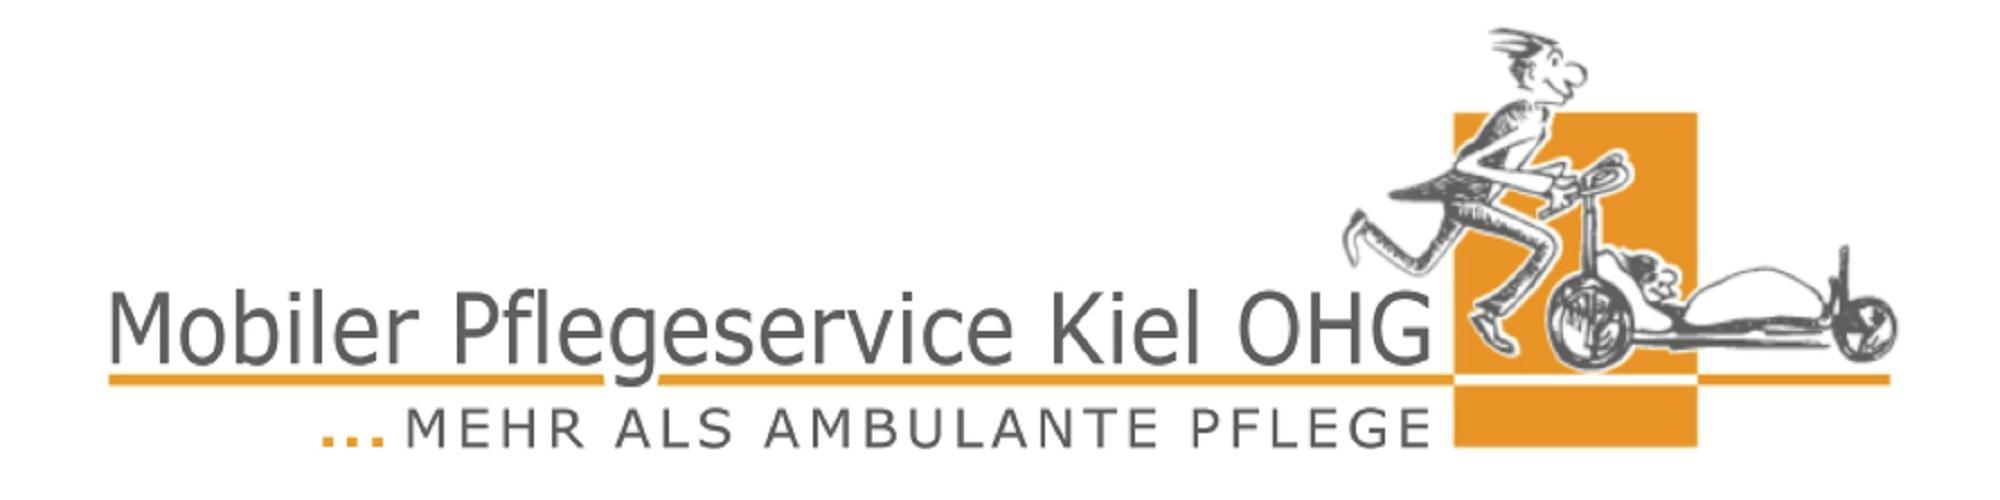 Mobiler Pflegeservice Kiel OHG